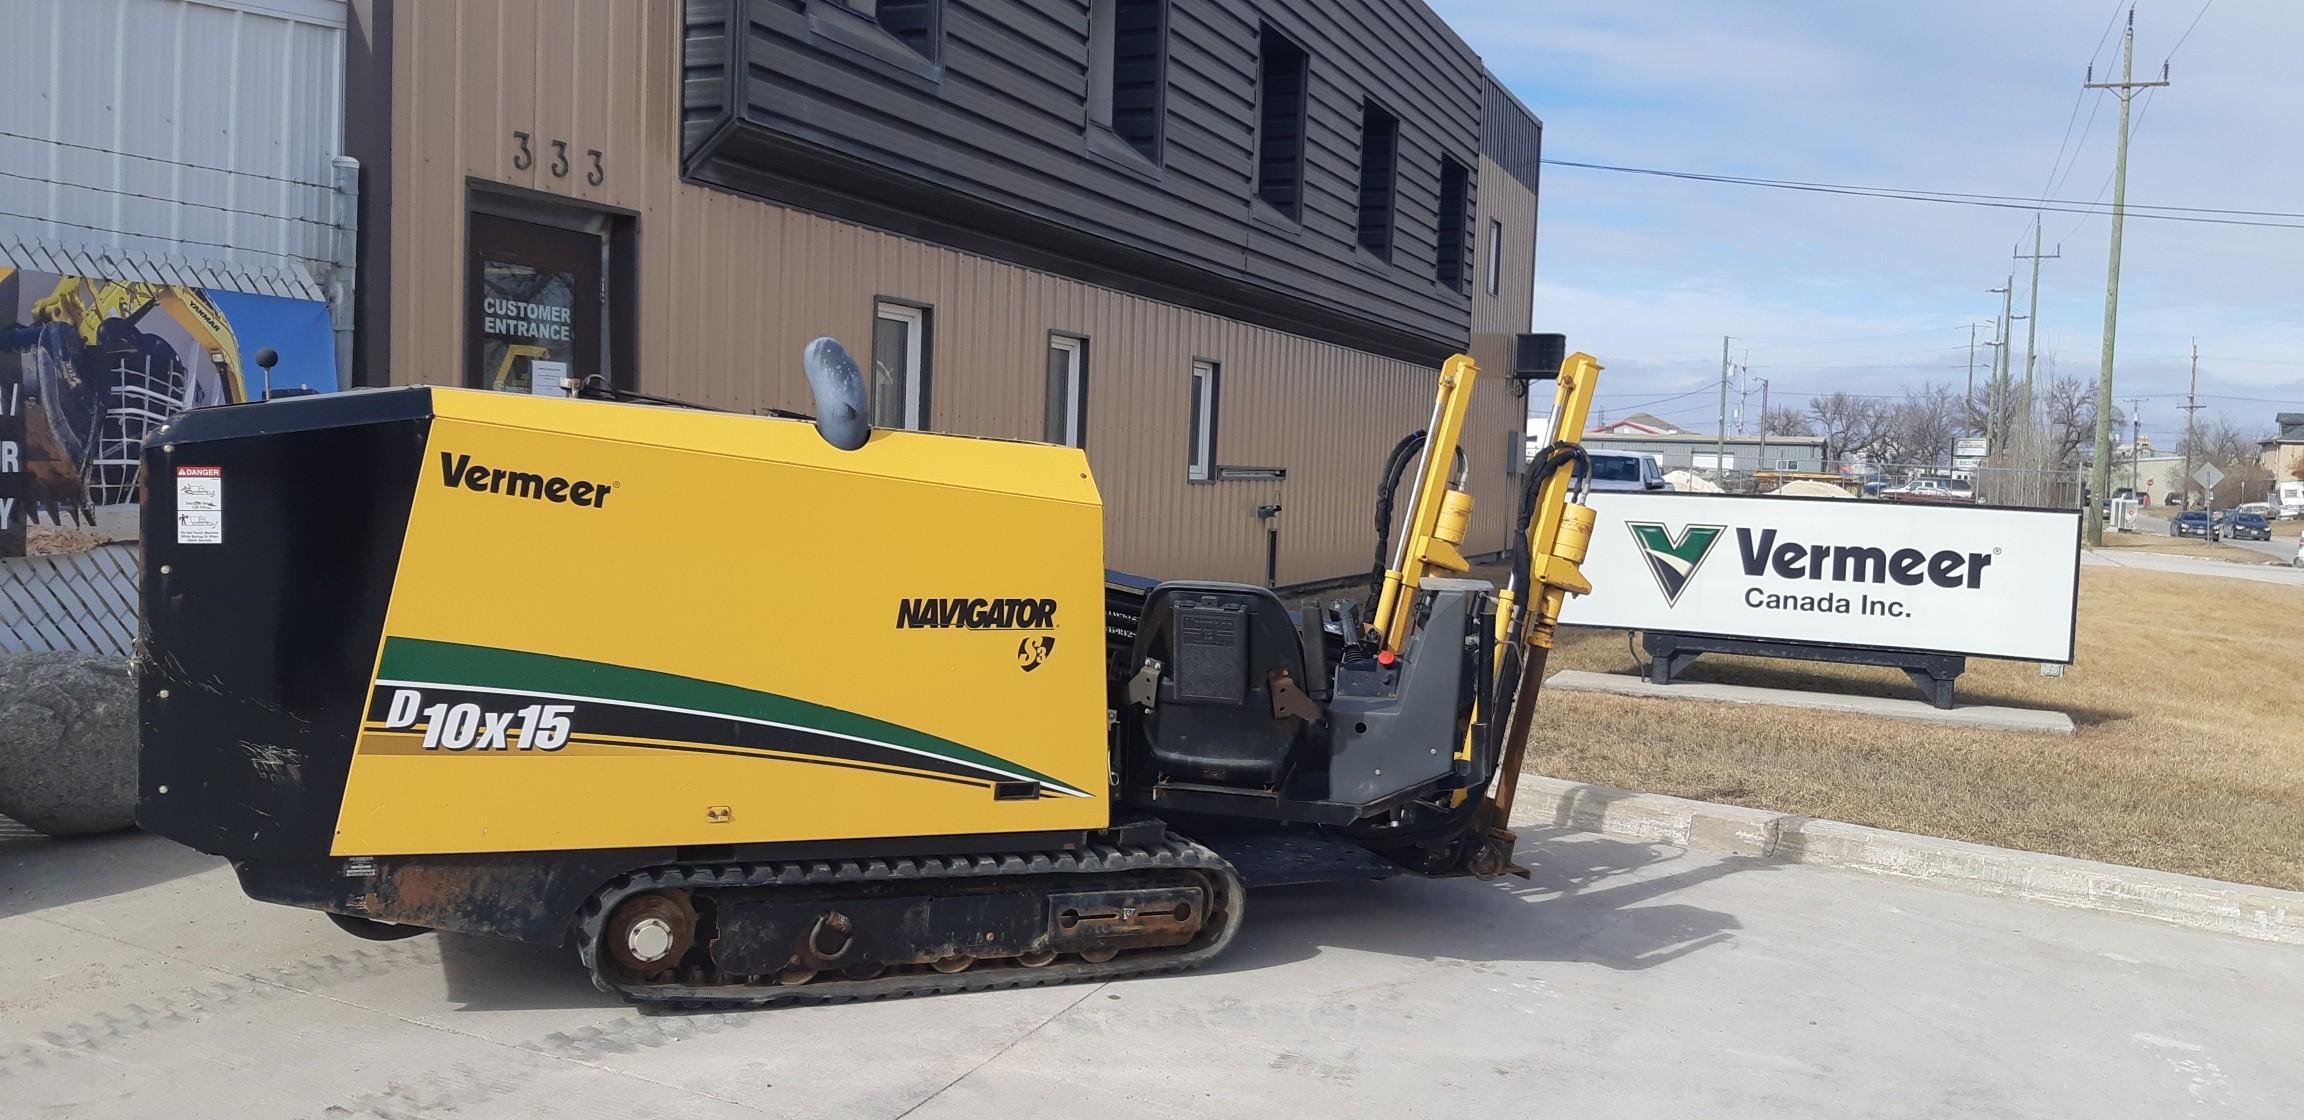 Used, 2017, Vermeer, D10x15 S3, Boring / Drilling Machines